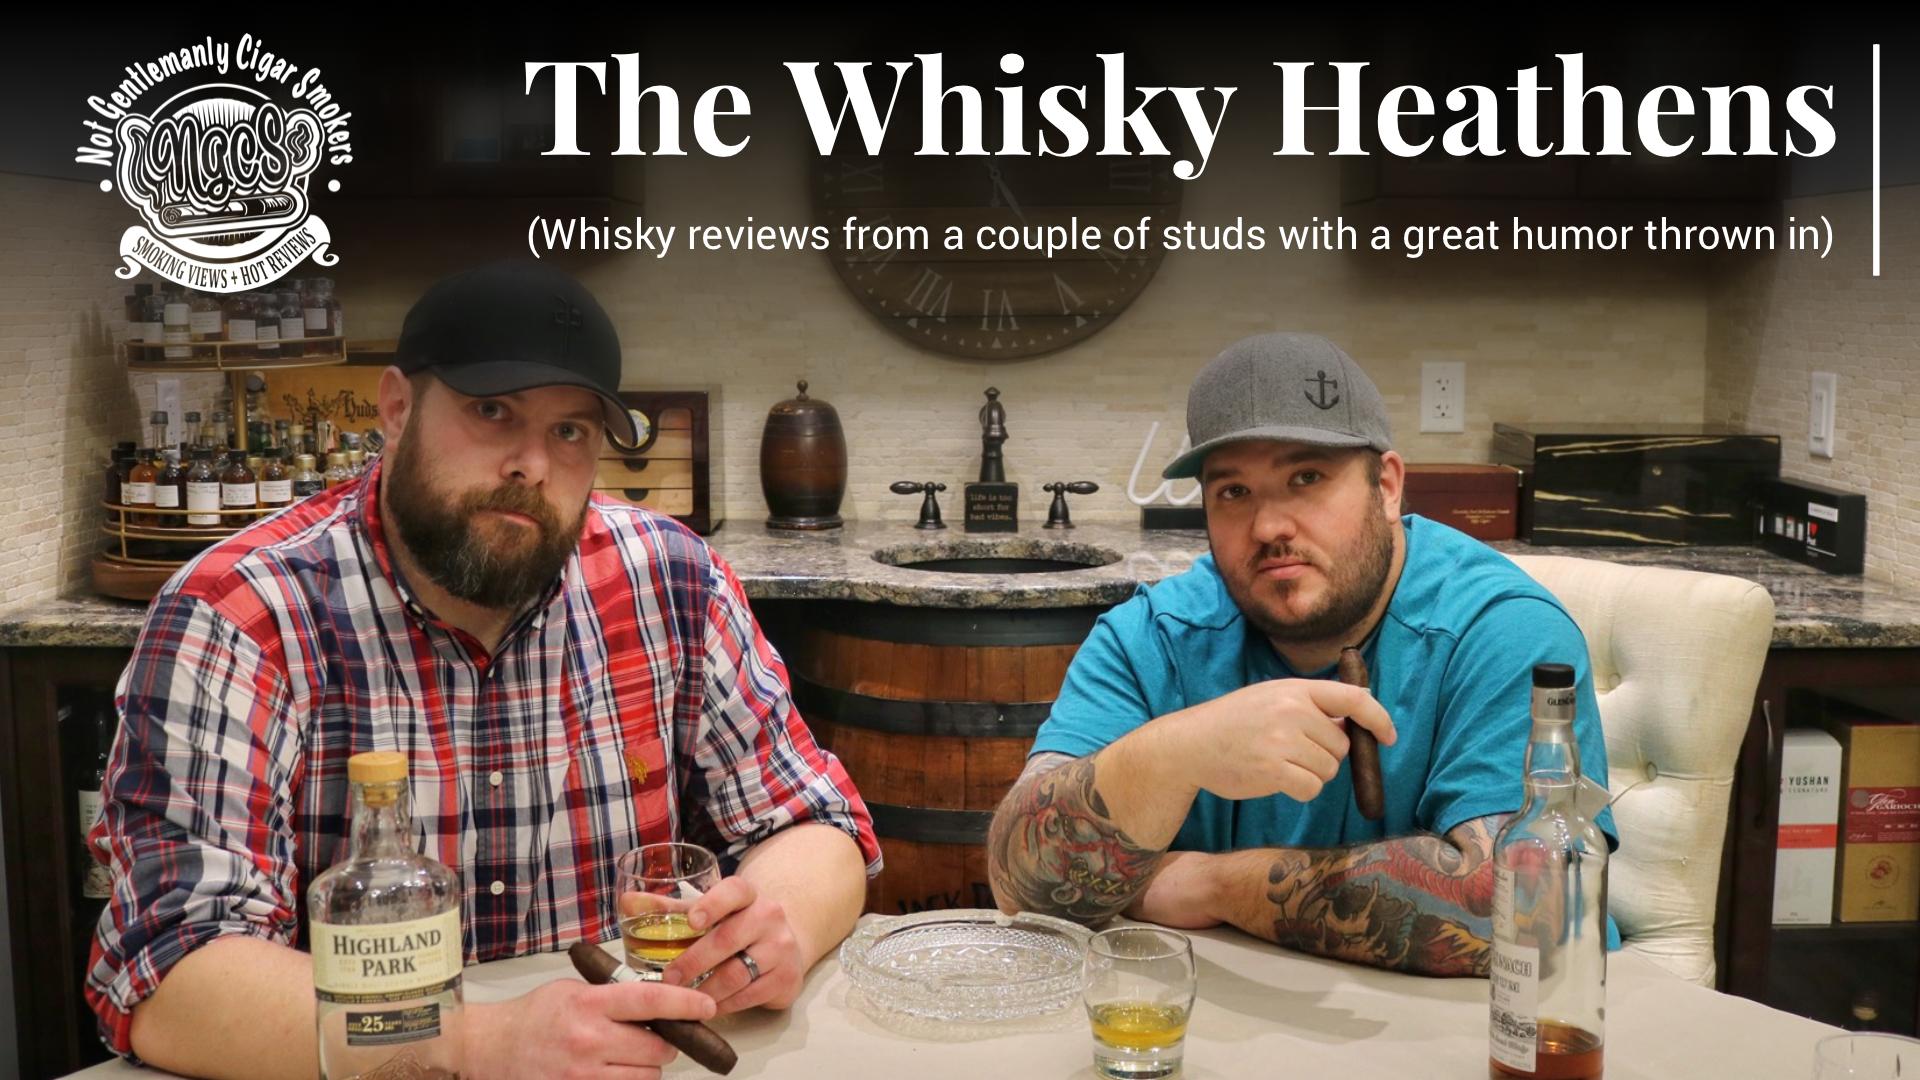 Whisky Heathens Pairing: Taconic Distillery Straight Bourbon Whiskey & Alec Bradley's Magic Toast